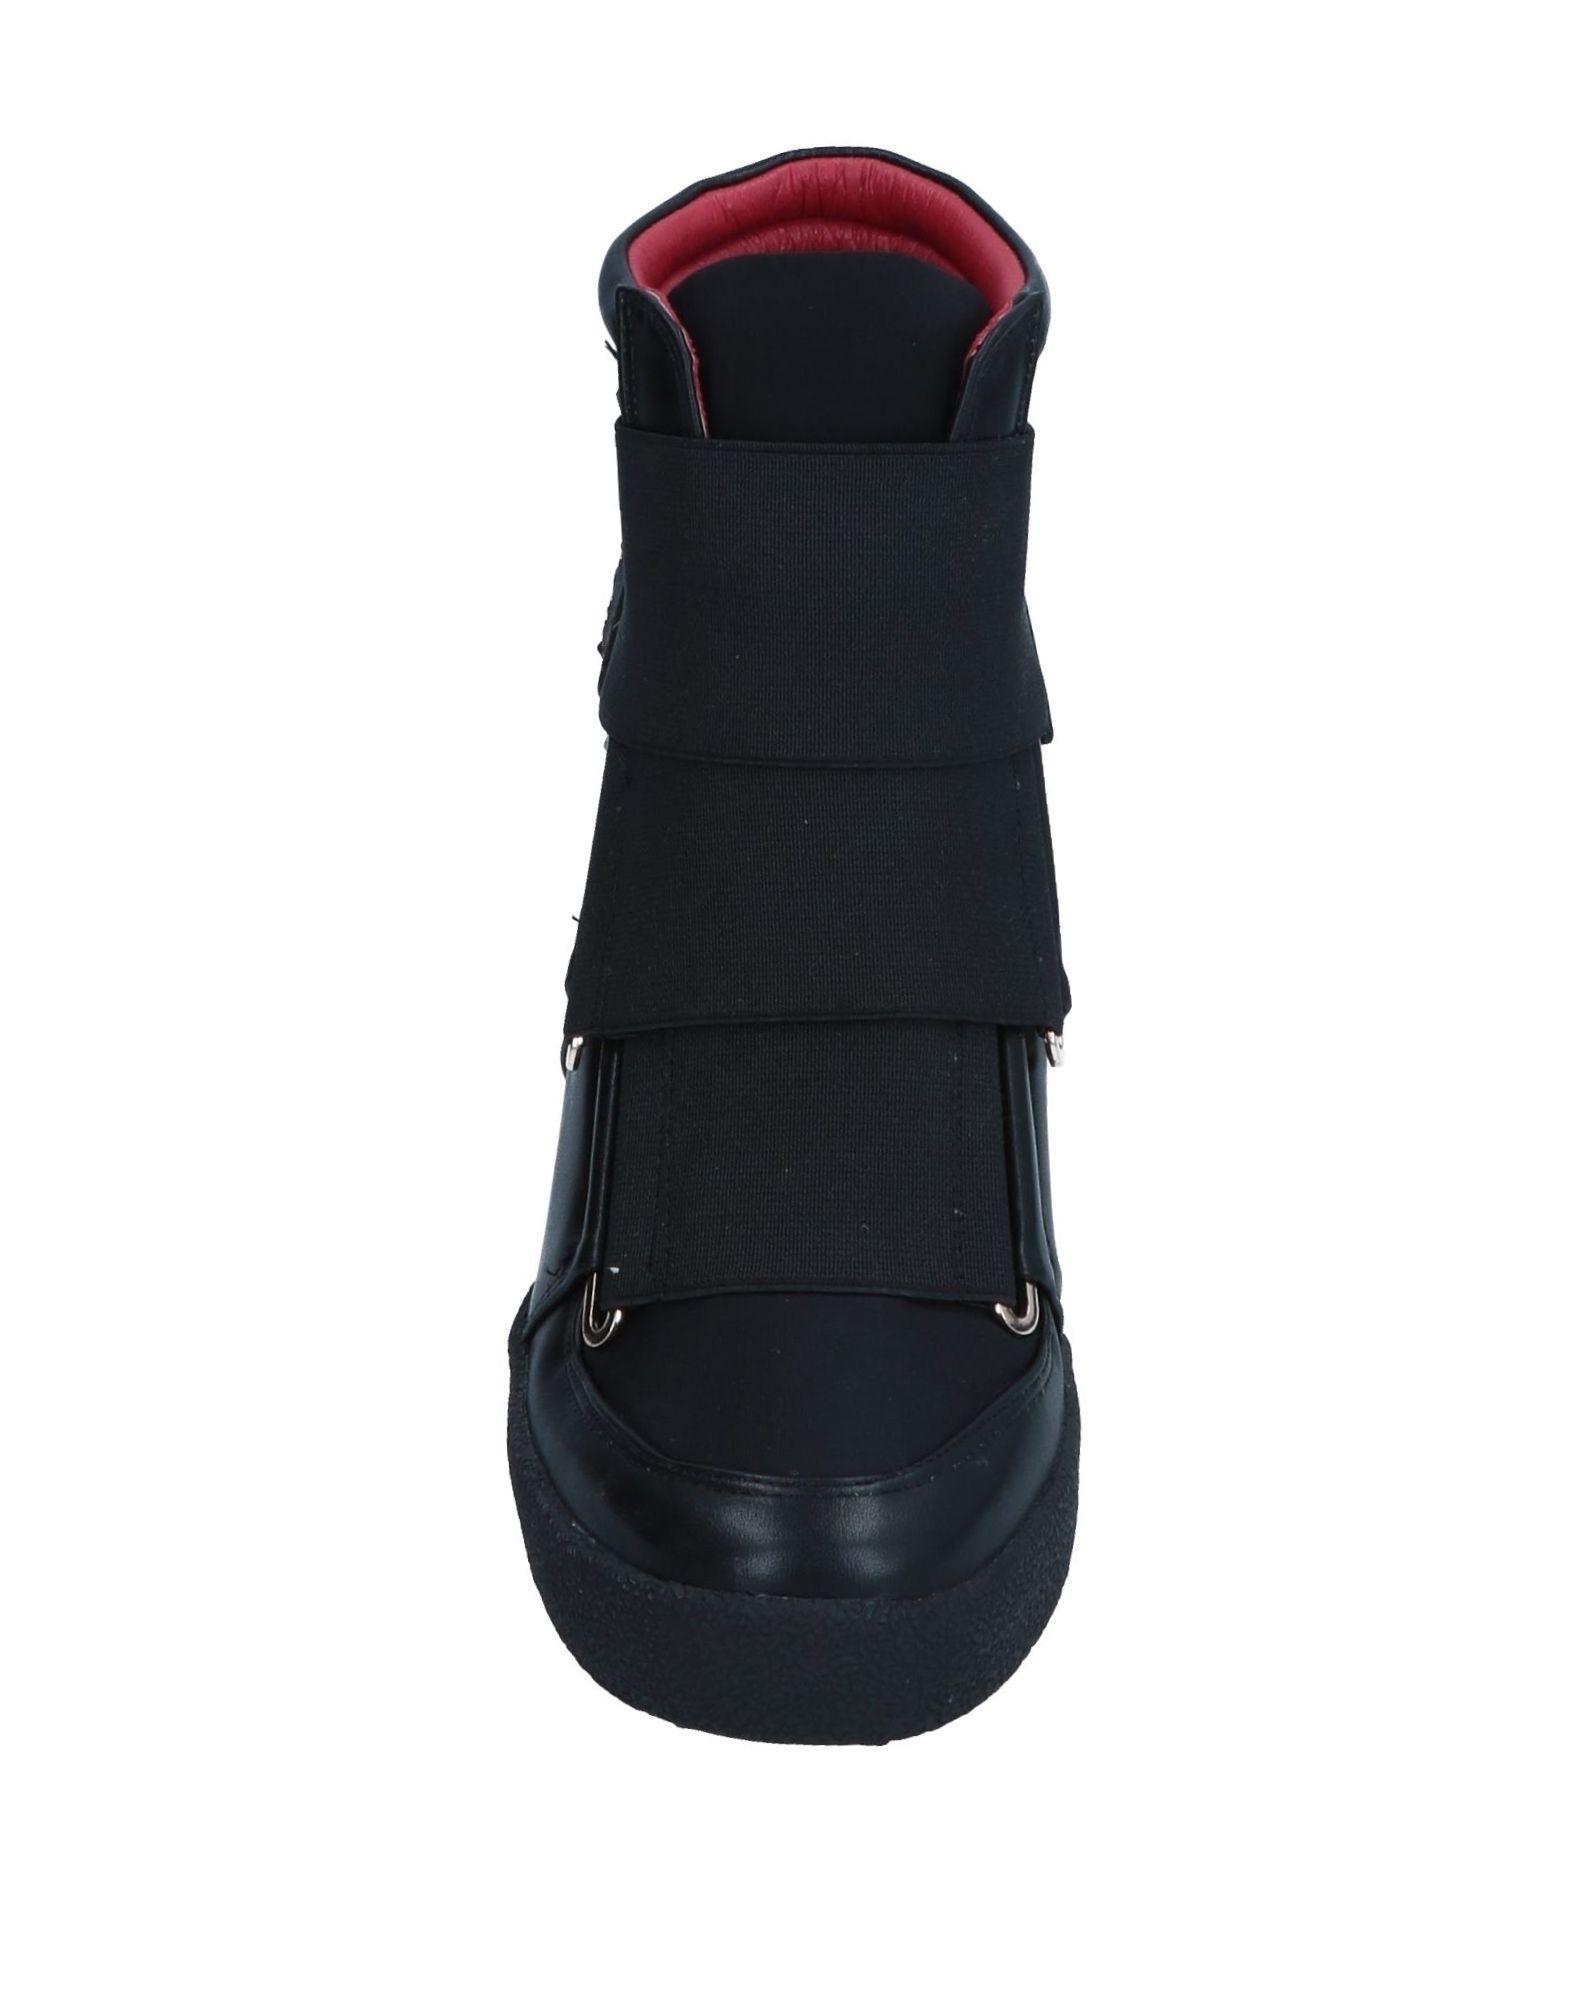 Gai Mattiolo Stiefelette Damen Gute  11546706NO Gute Damen Qualität beliebte Schuhe ff2f7e